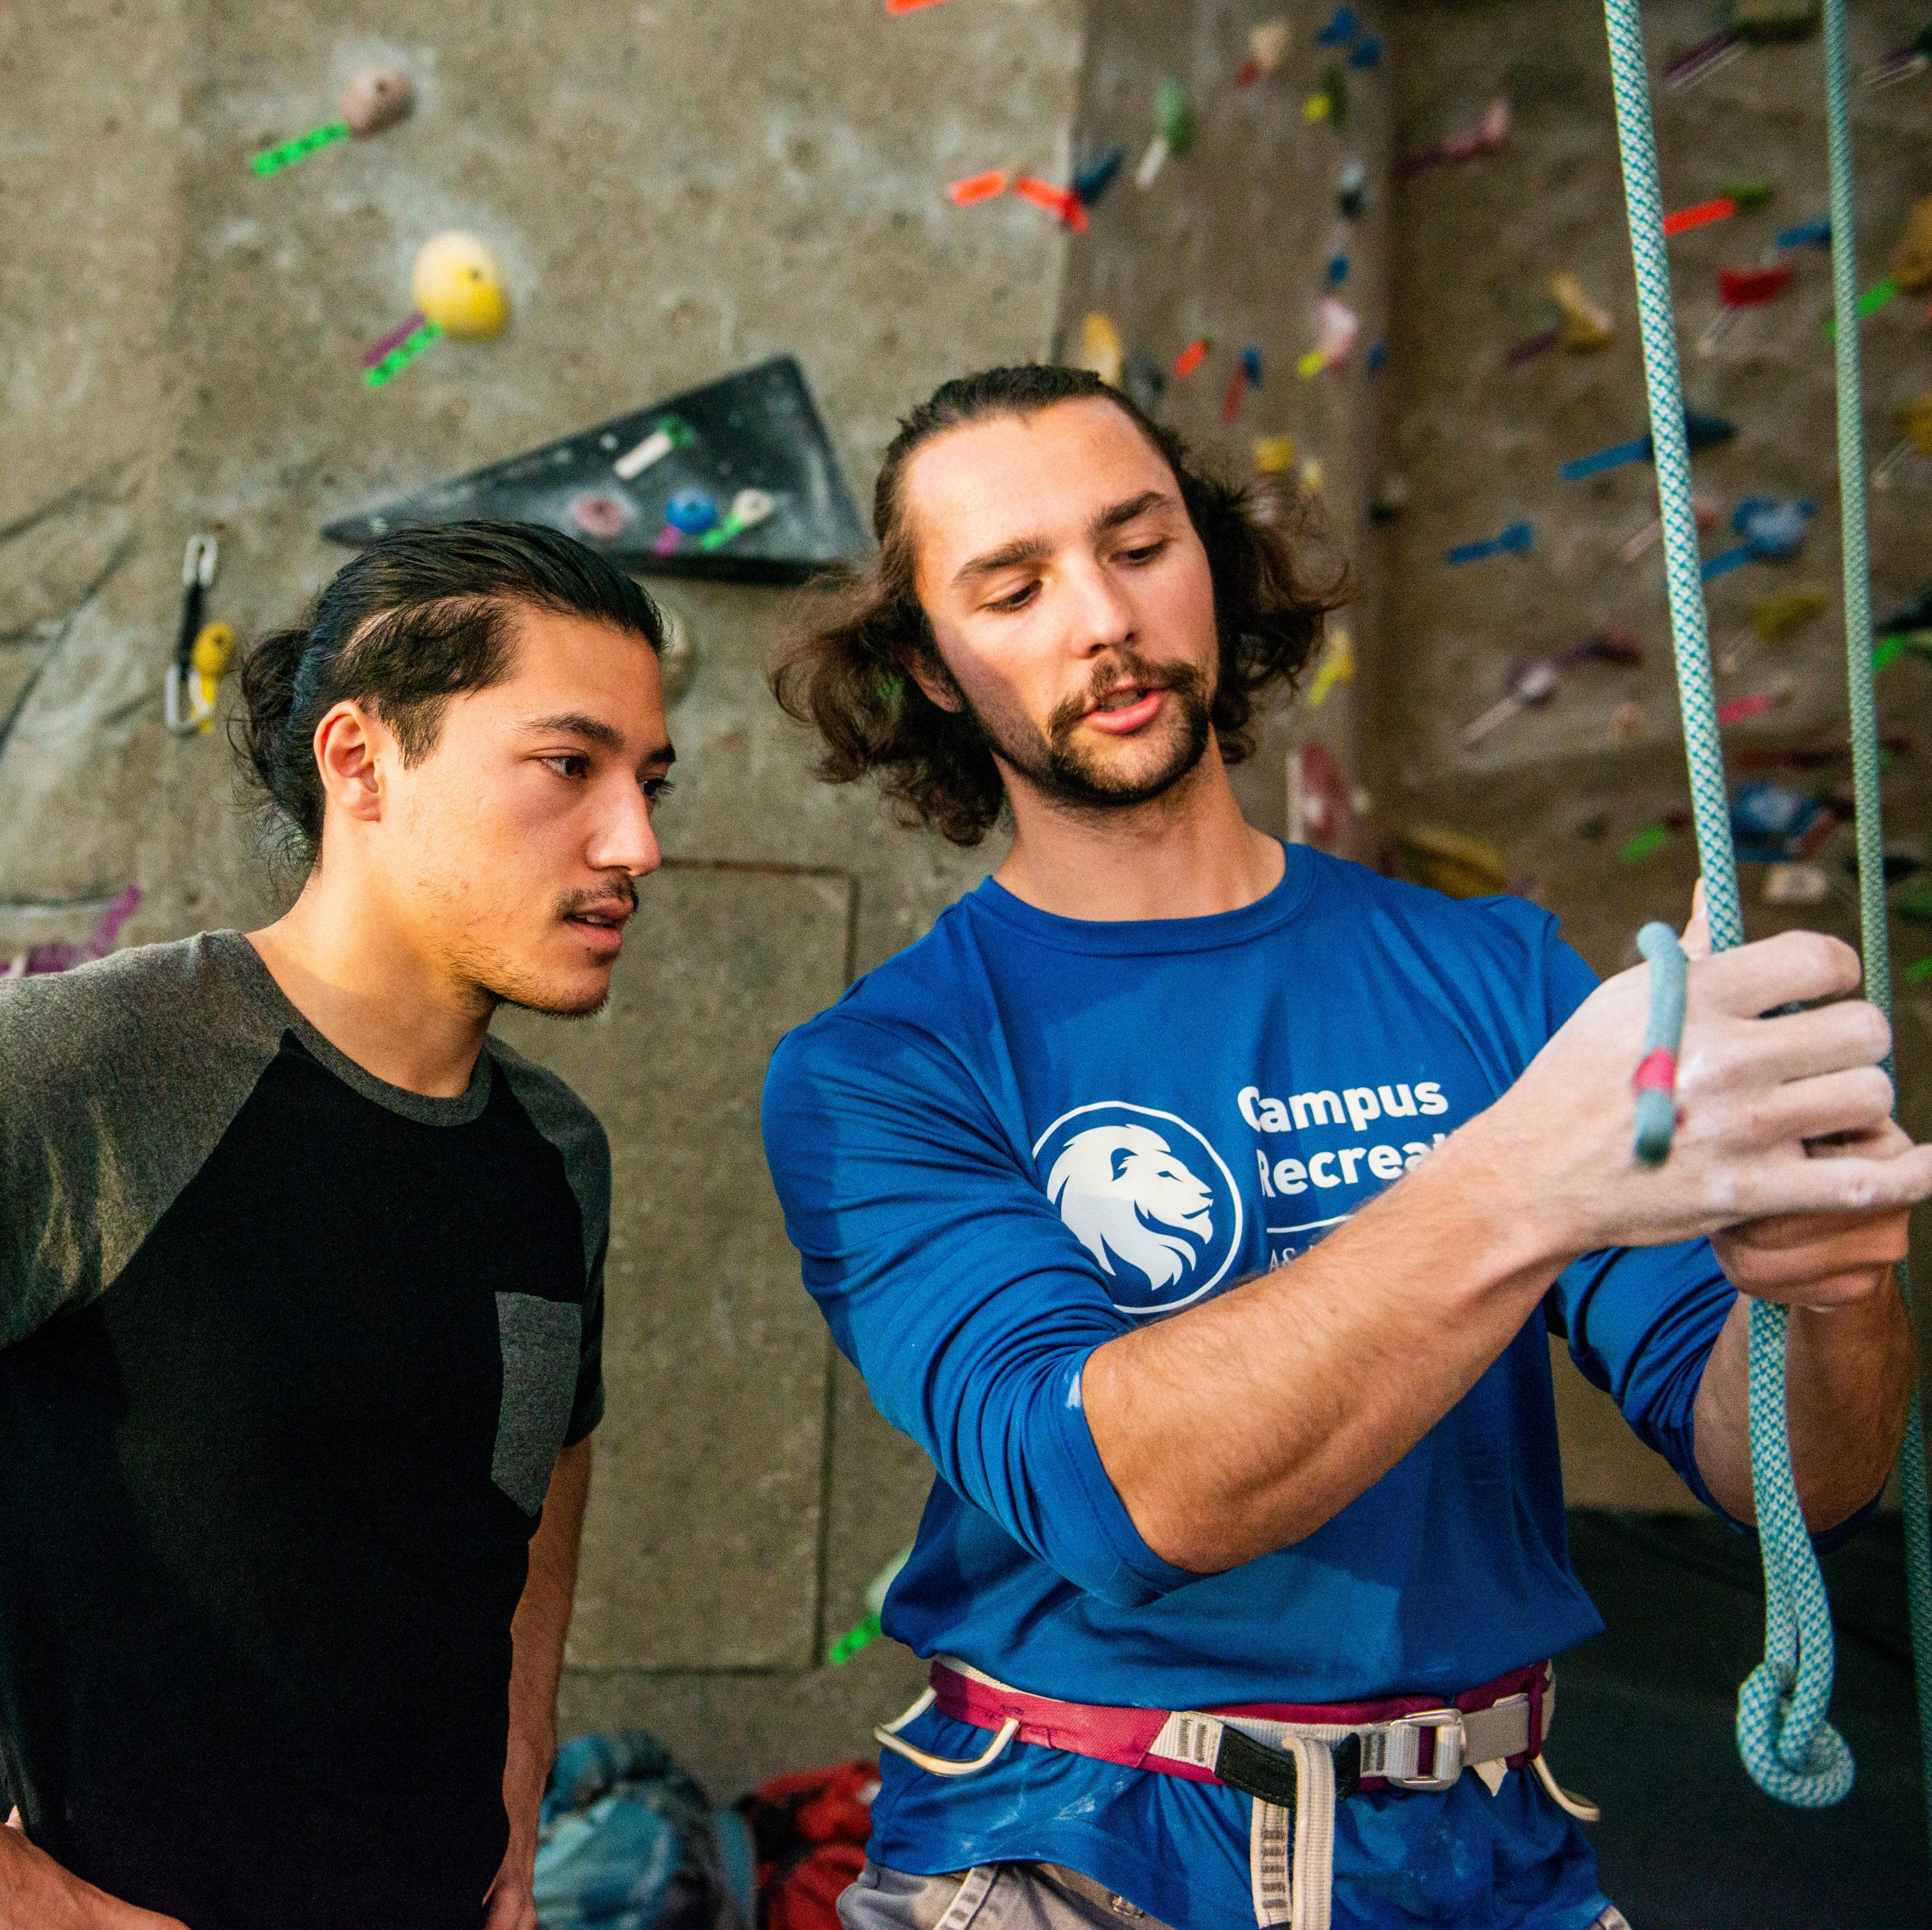 Rock climber instructing a student.